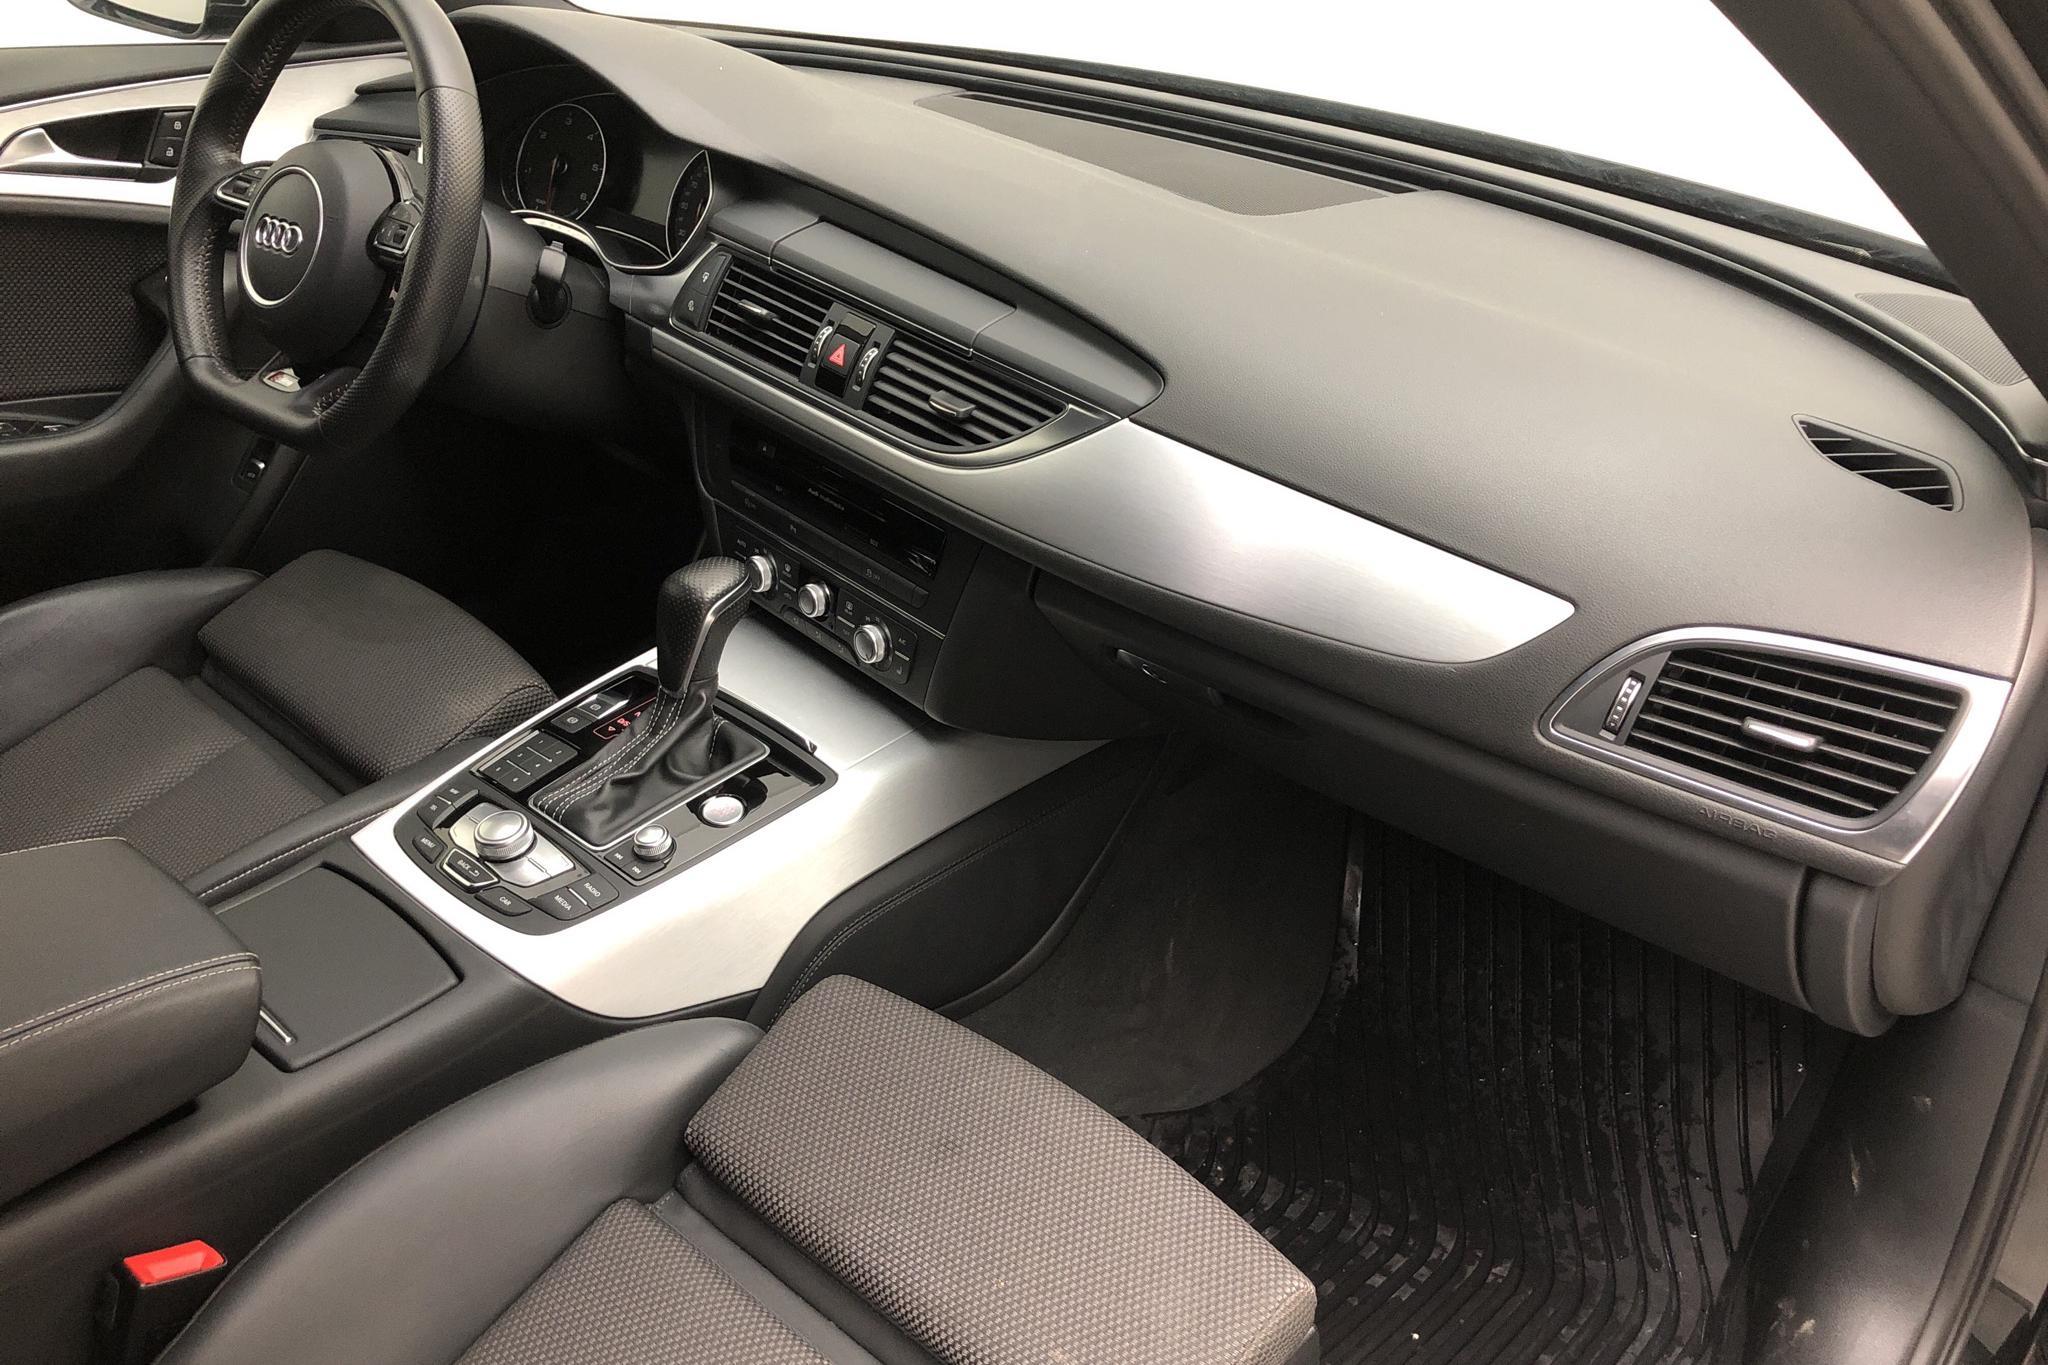 Audi A6 2.0 TDI Avant (190hk) - 6 328 mil - Automat - svart - 2018